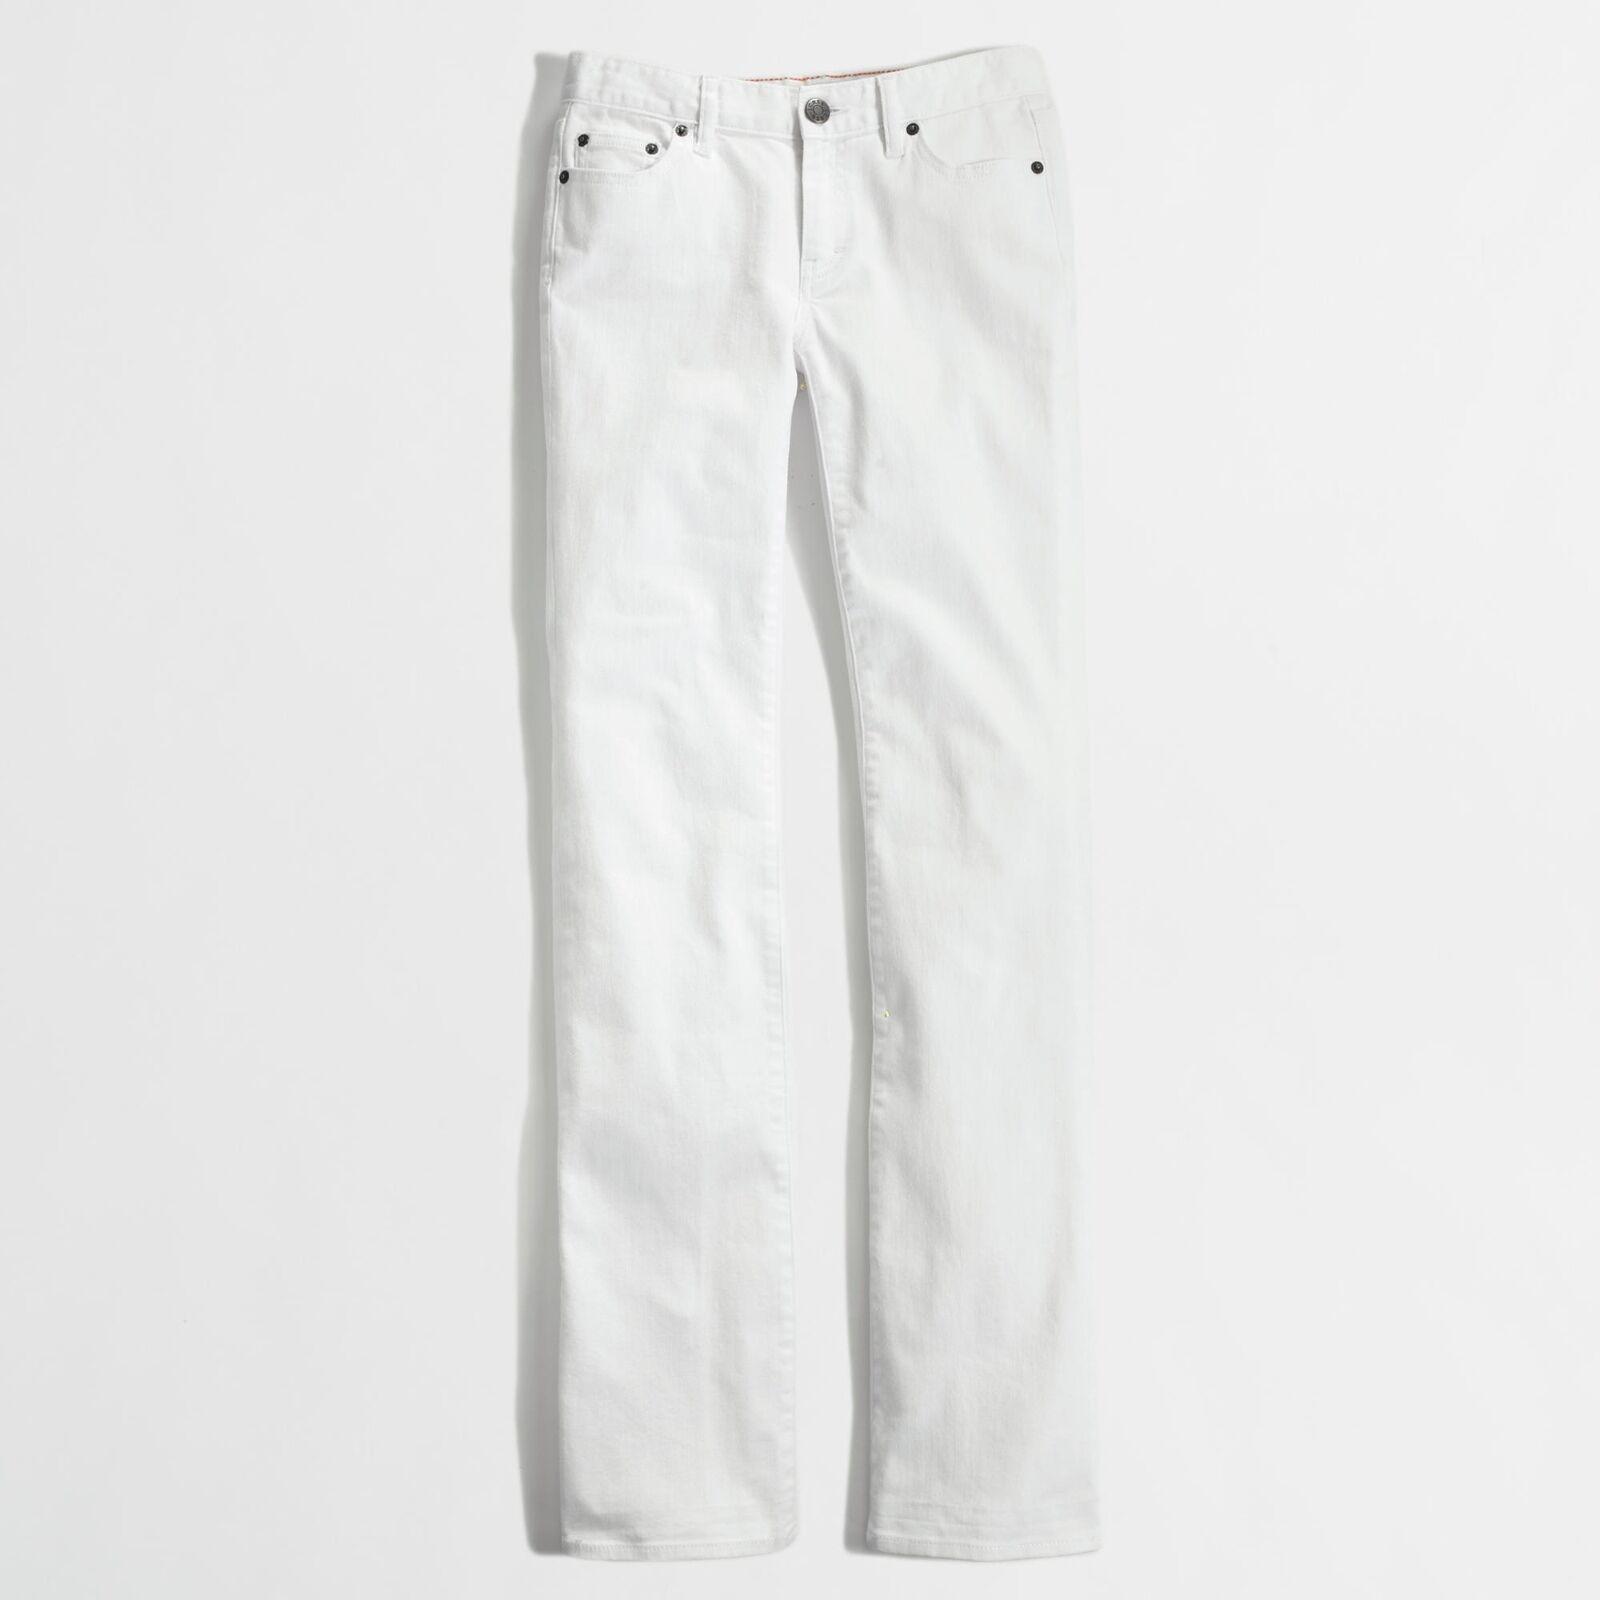 J.Crew Fabrik - Damen 35 (16) - Nwt - Einfarbig Weiß 32   Stiefelcut-Jeans